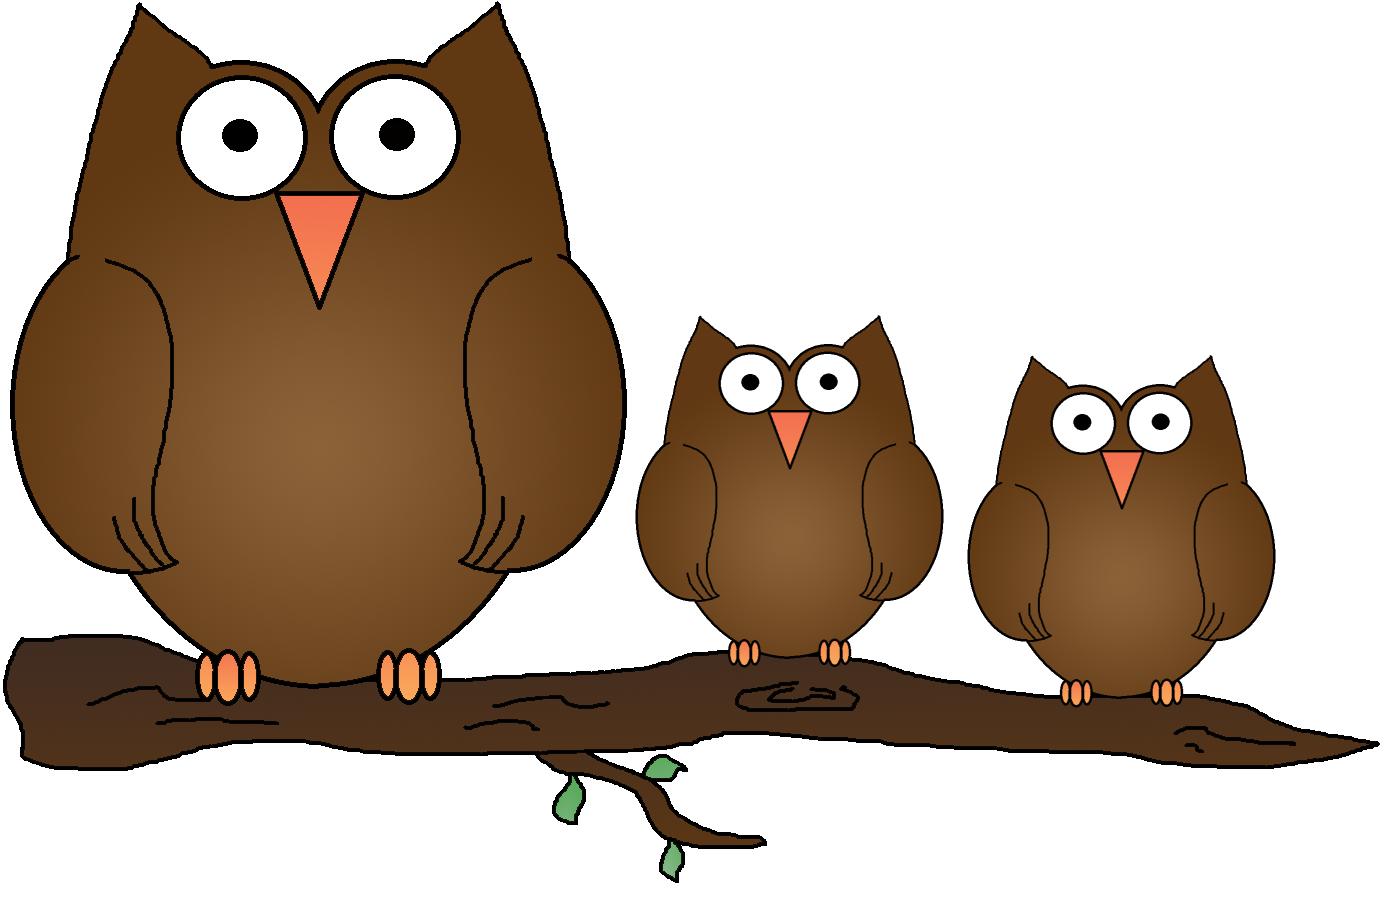 Pilgrim clipart owl. Owlet branch clip art